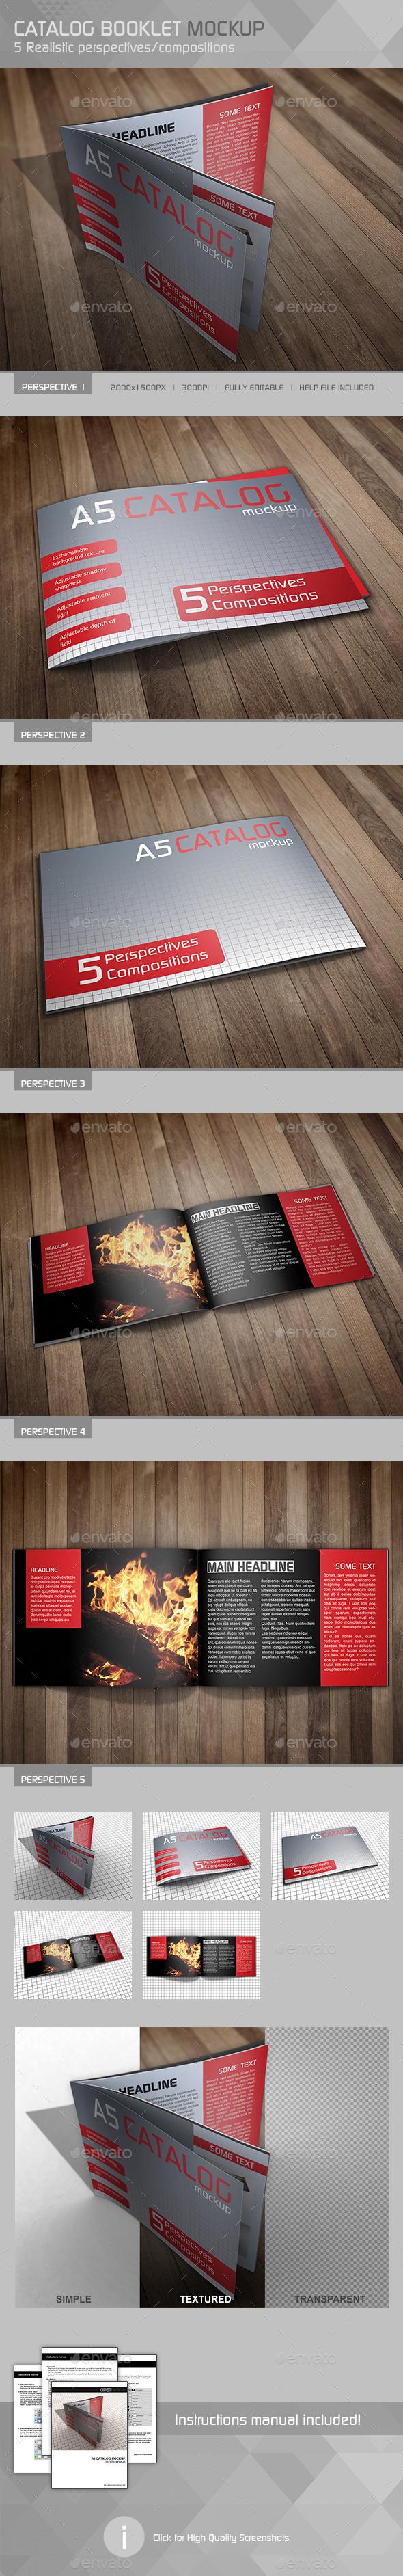 Realistic A5 Catalog Mockup